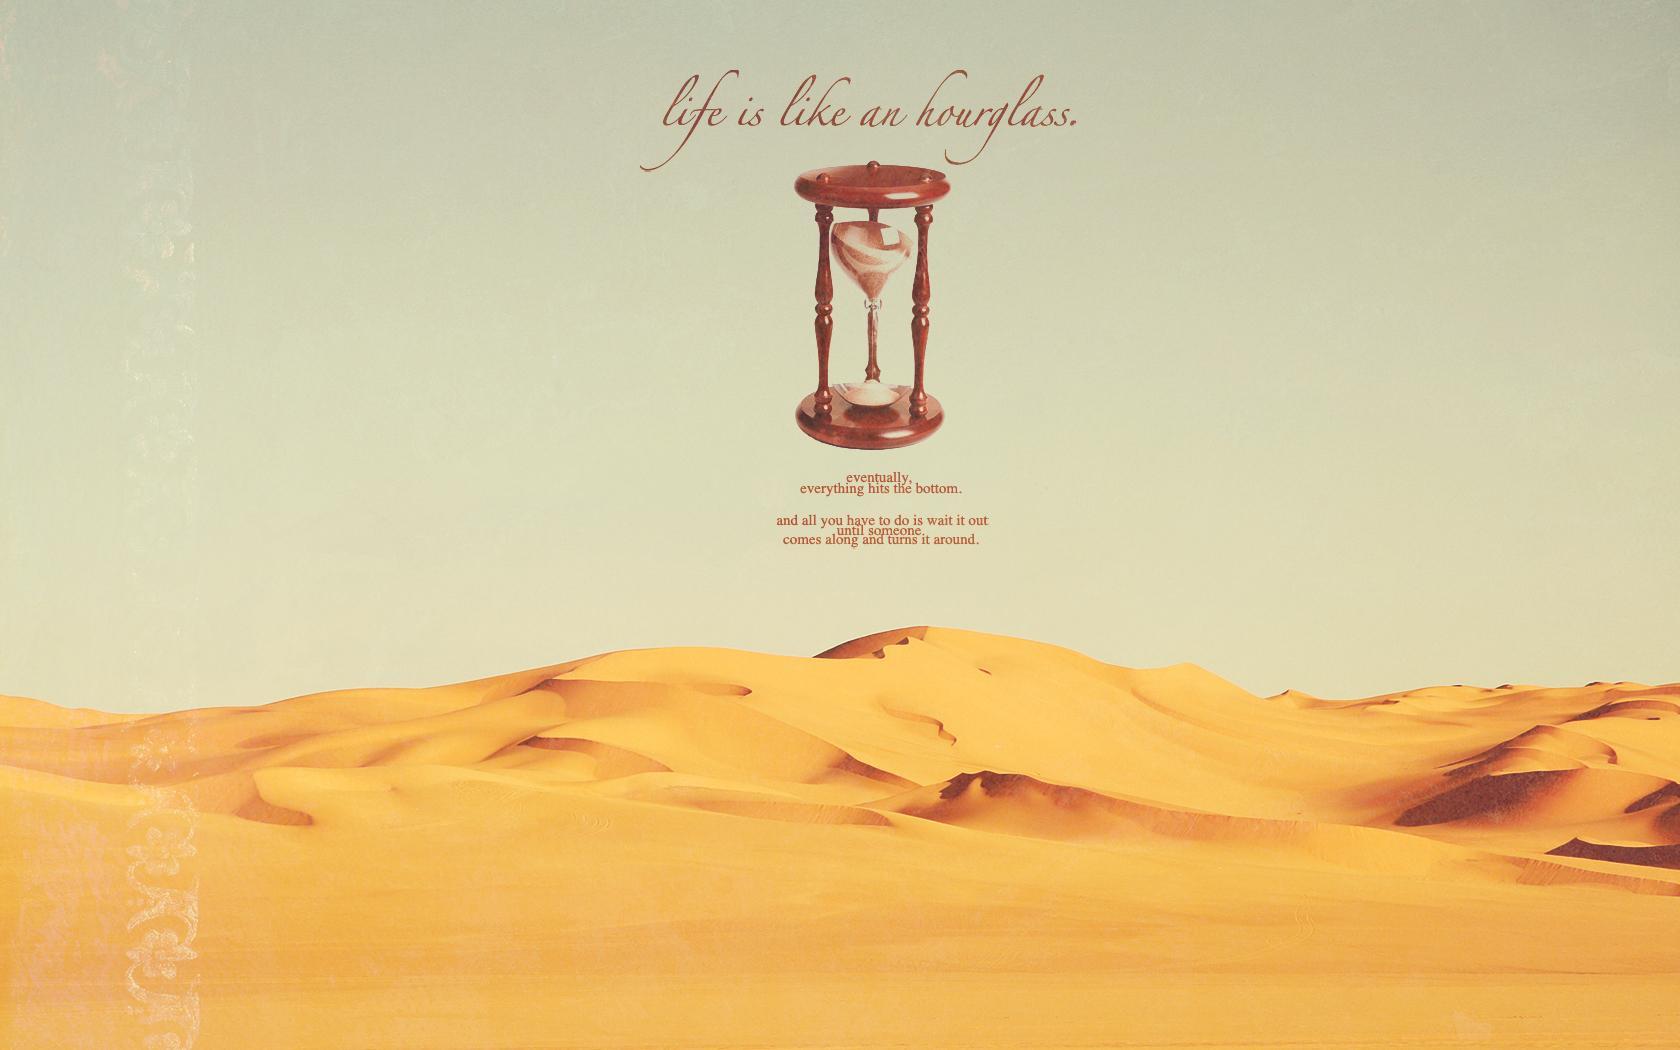 Desert quote #2